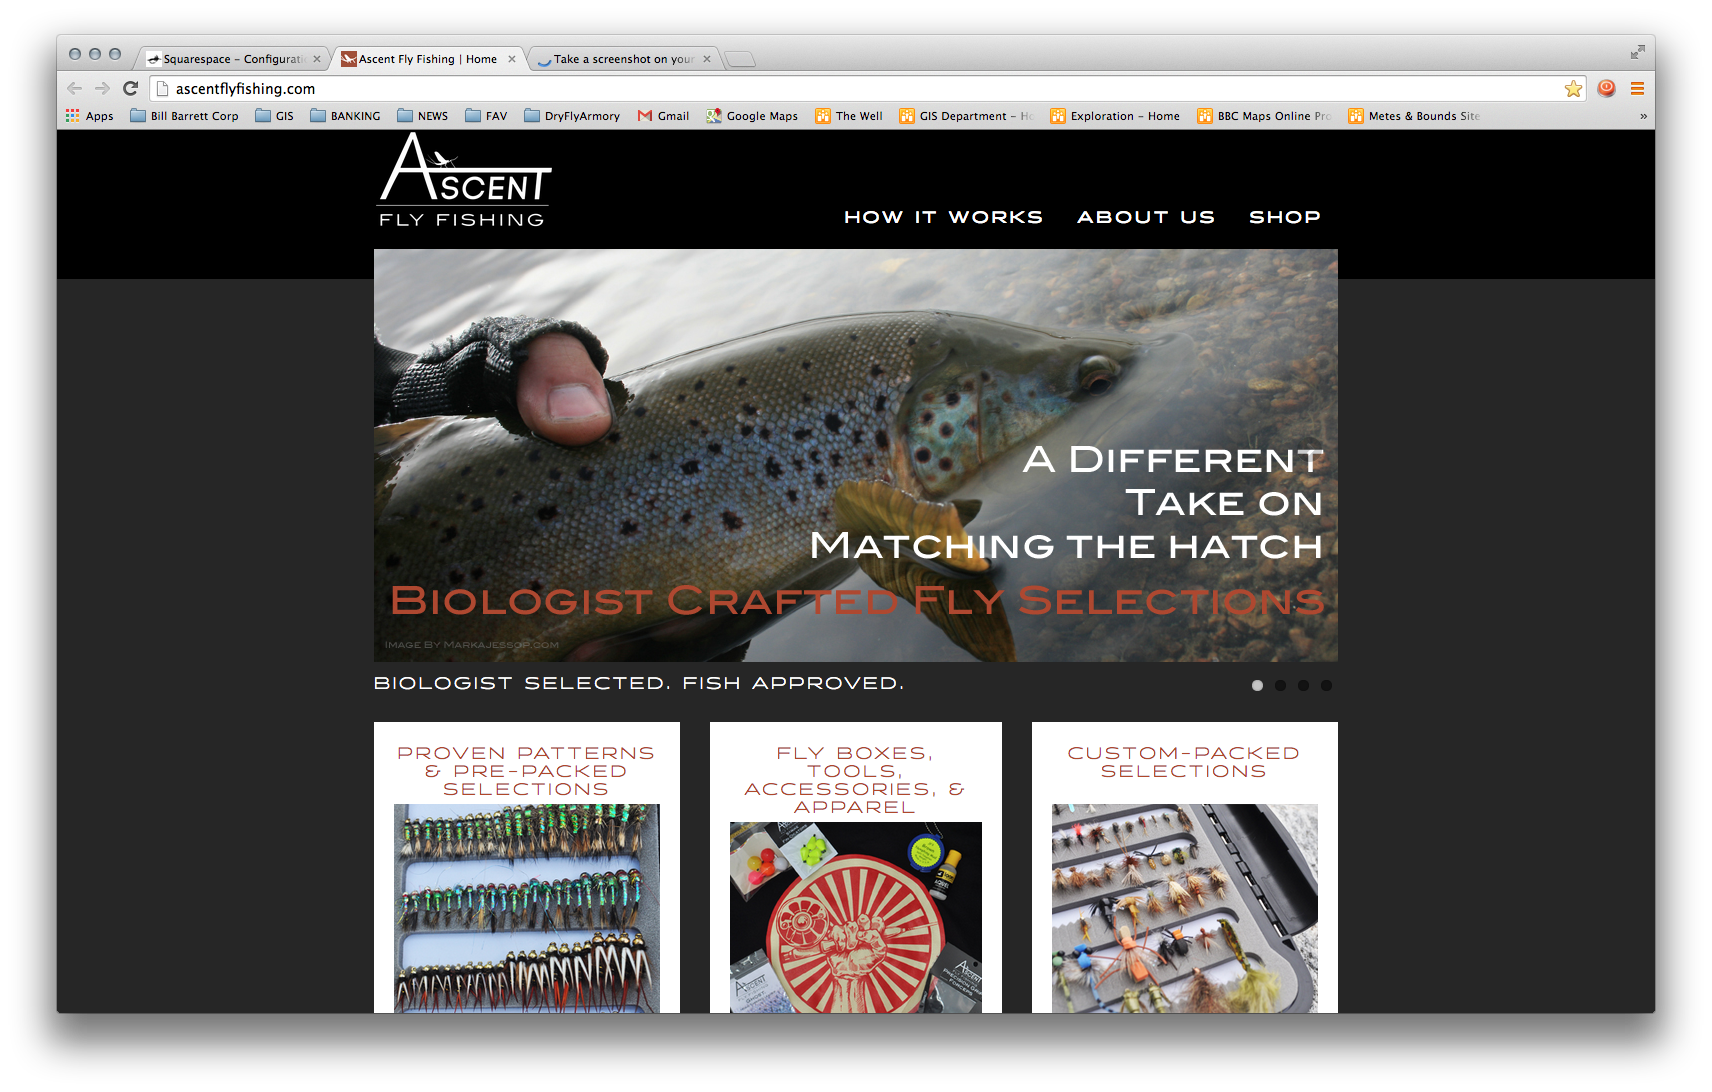 http://ascentflyfishing.com/